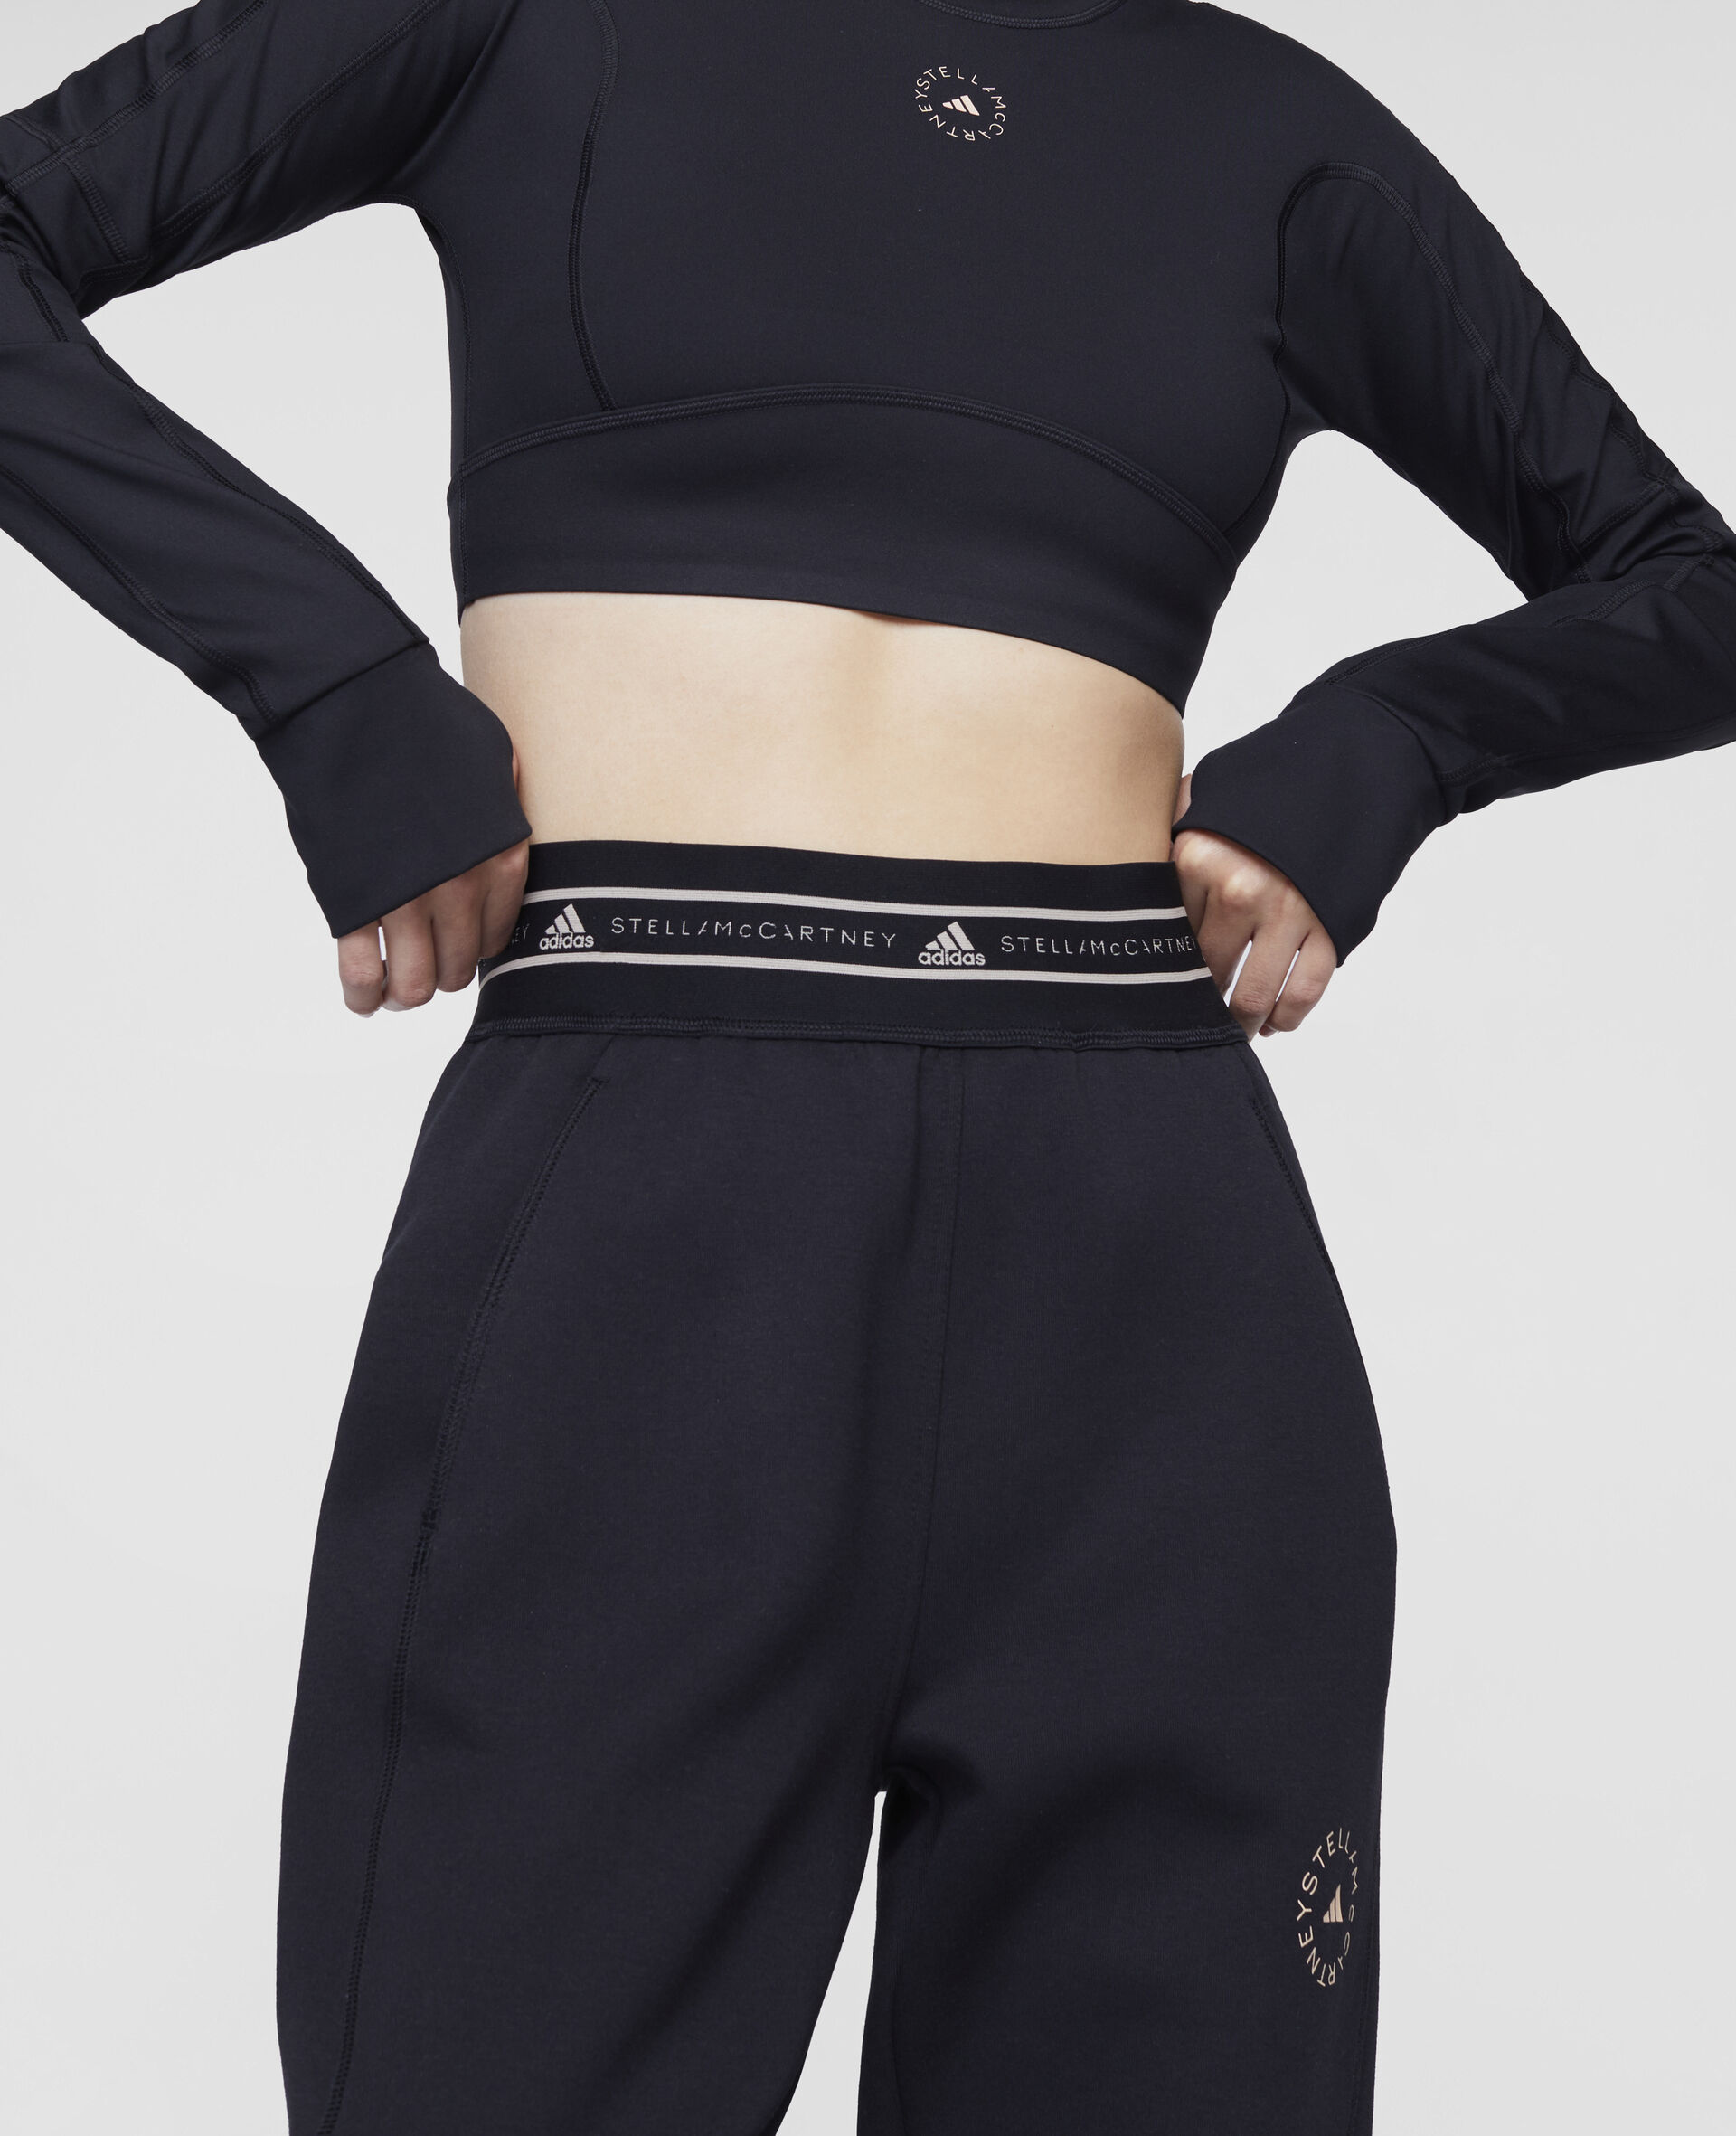 Black Training Sweatpants-Black-large image number 3